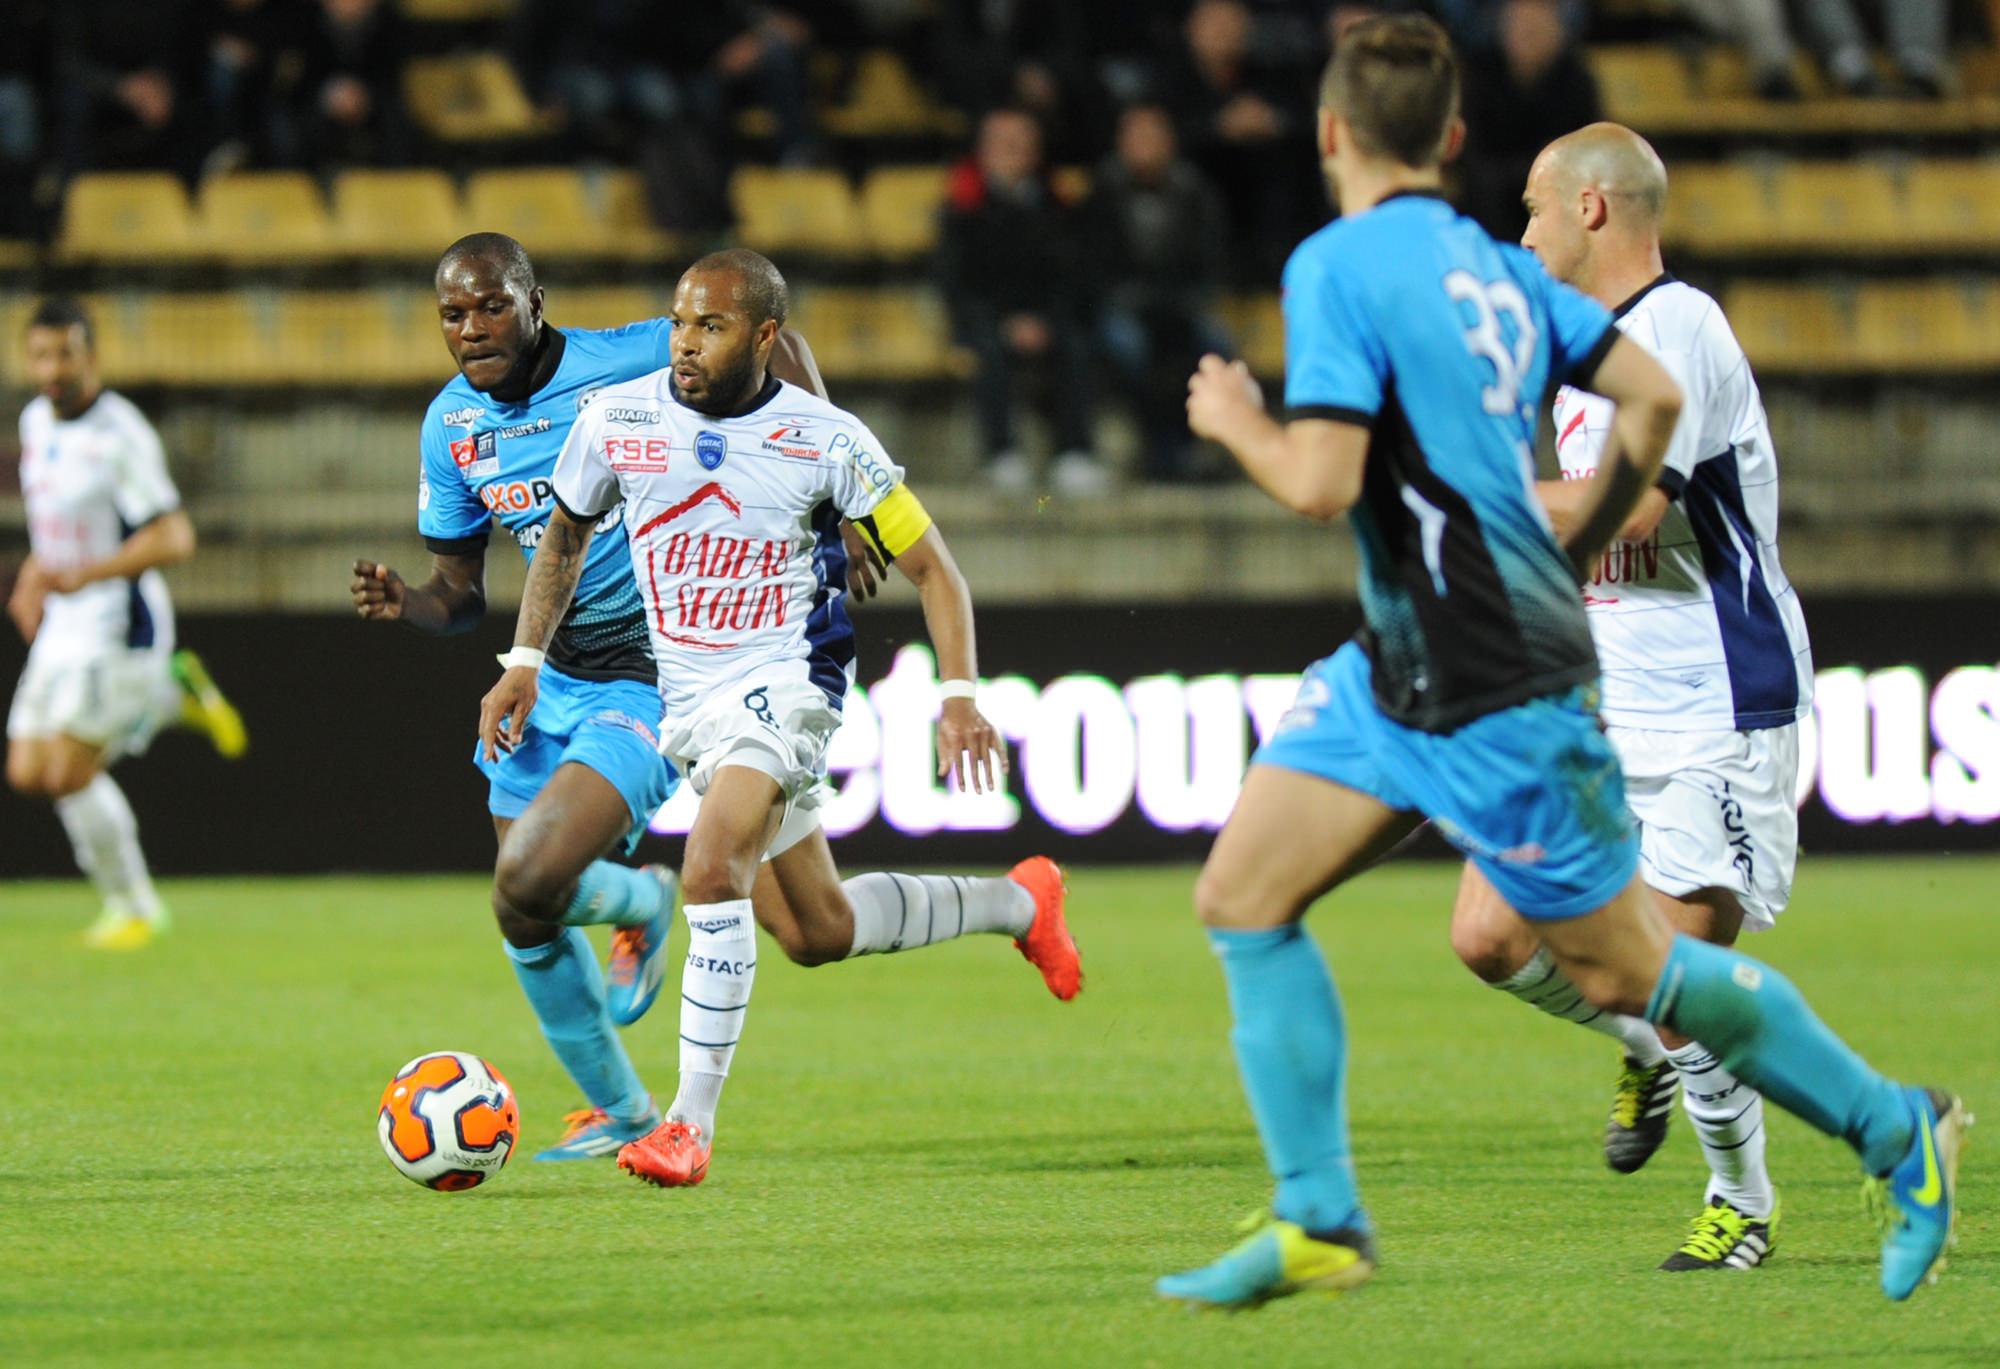 Ligue 2 match estac troyes vs aj auxerre en direct for Match estac